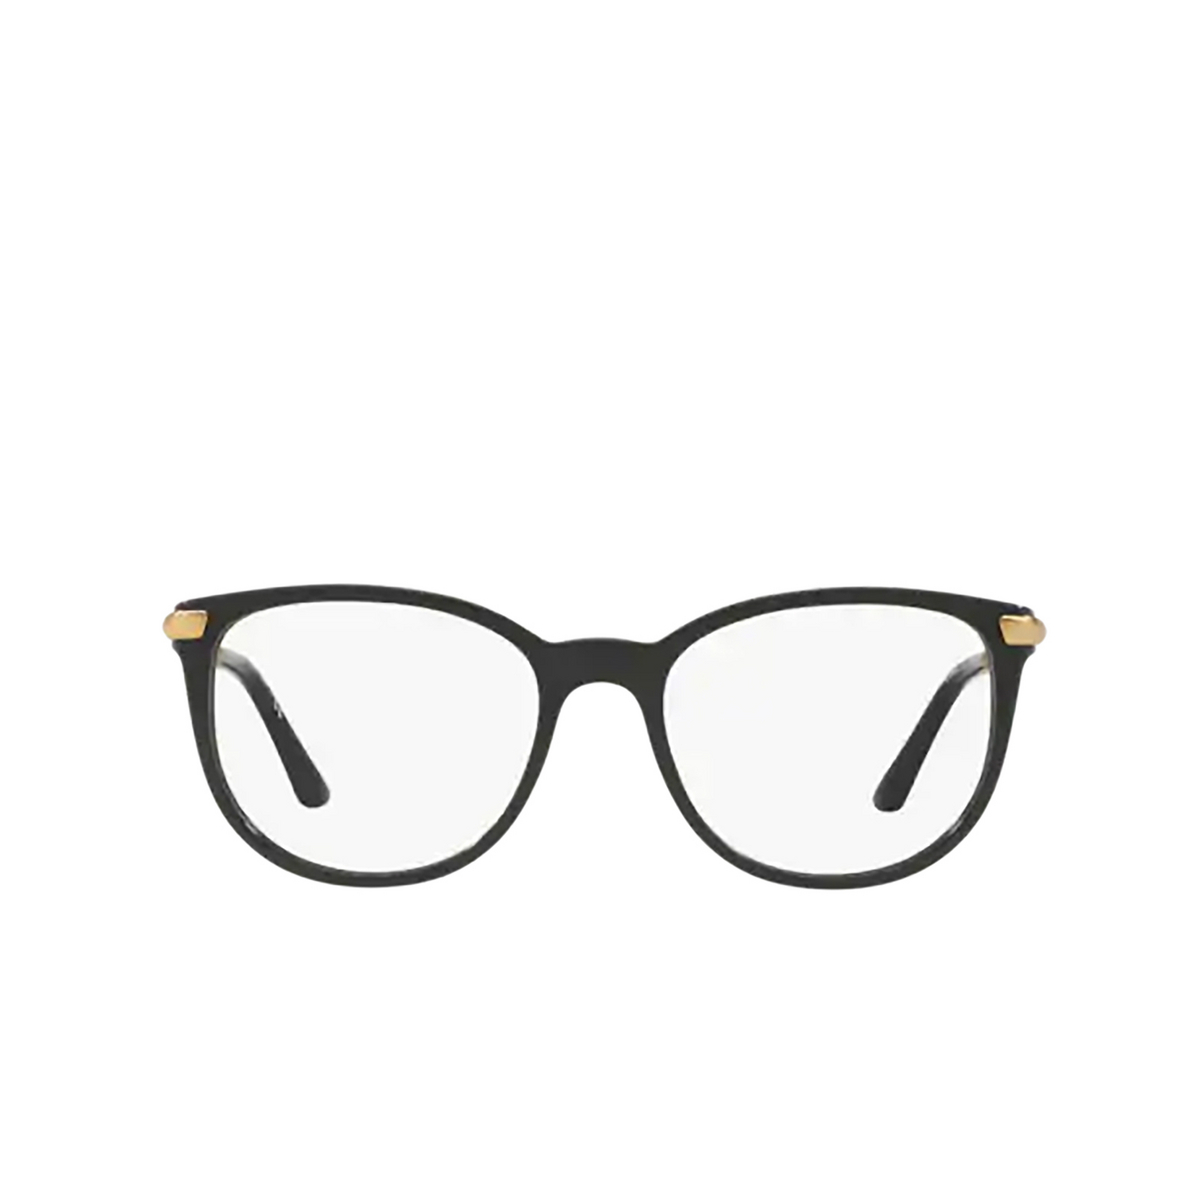 Burberry® Square Eyeglasses: BE2255Q color Black 3001 - front view.